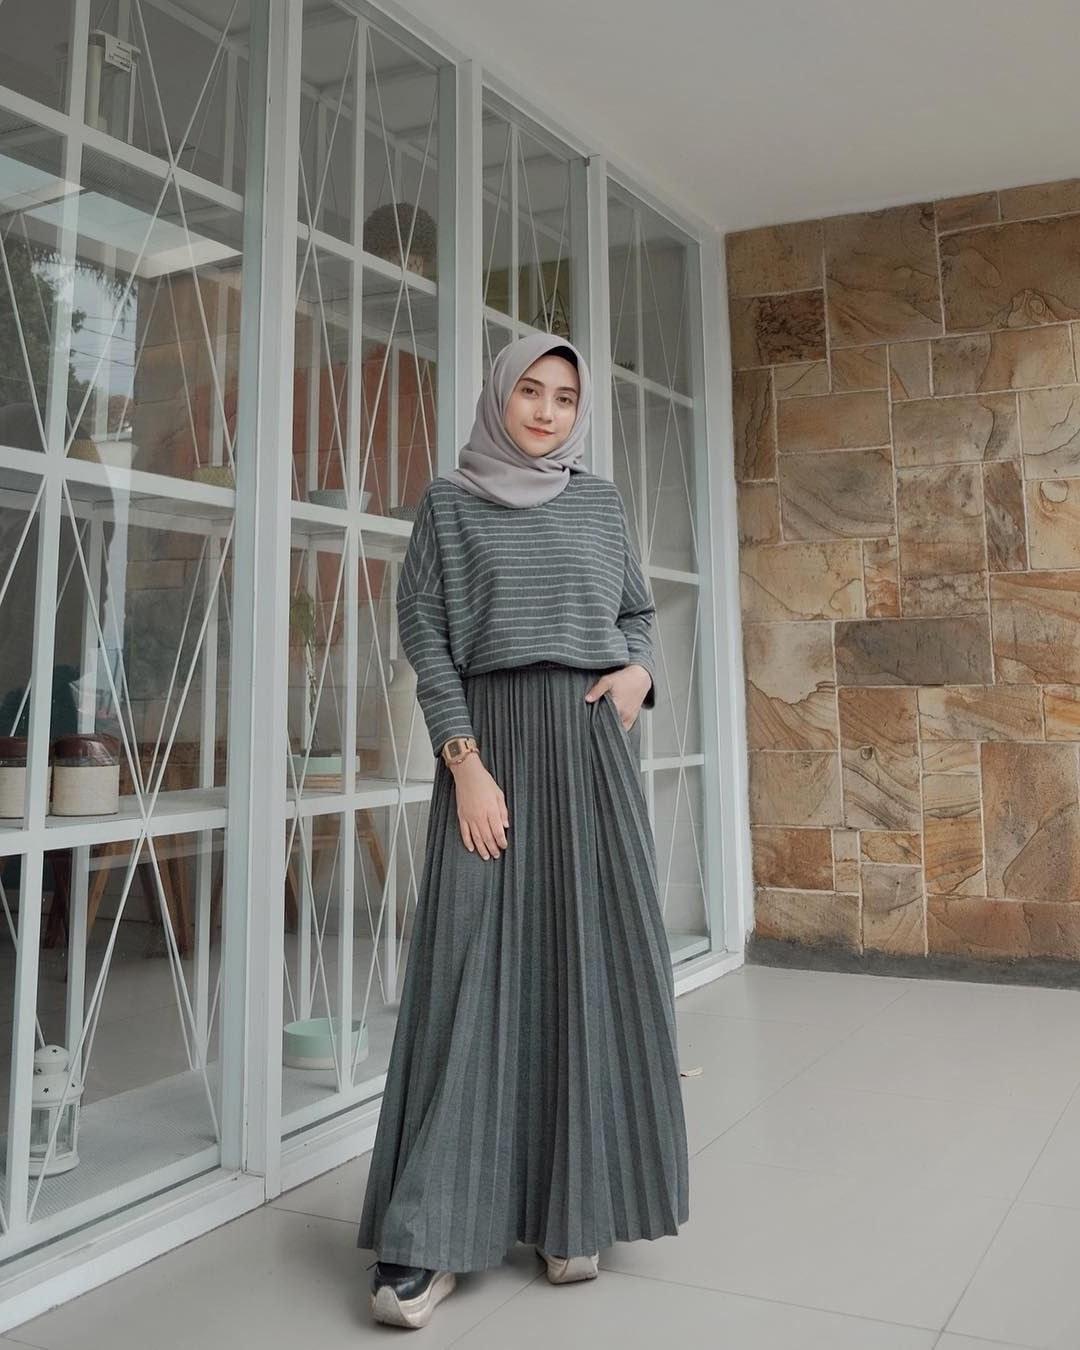 Inspirasi Trend Baju Lebaran 2019 Budm Baju Muslim Lebaran Terbaru 2019 Dengan Gambar